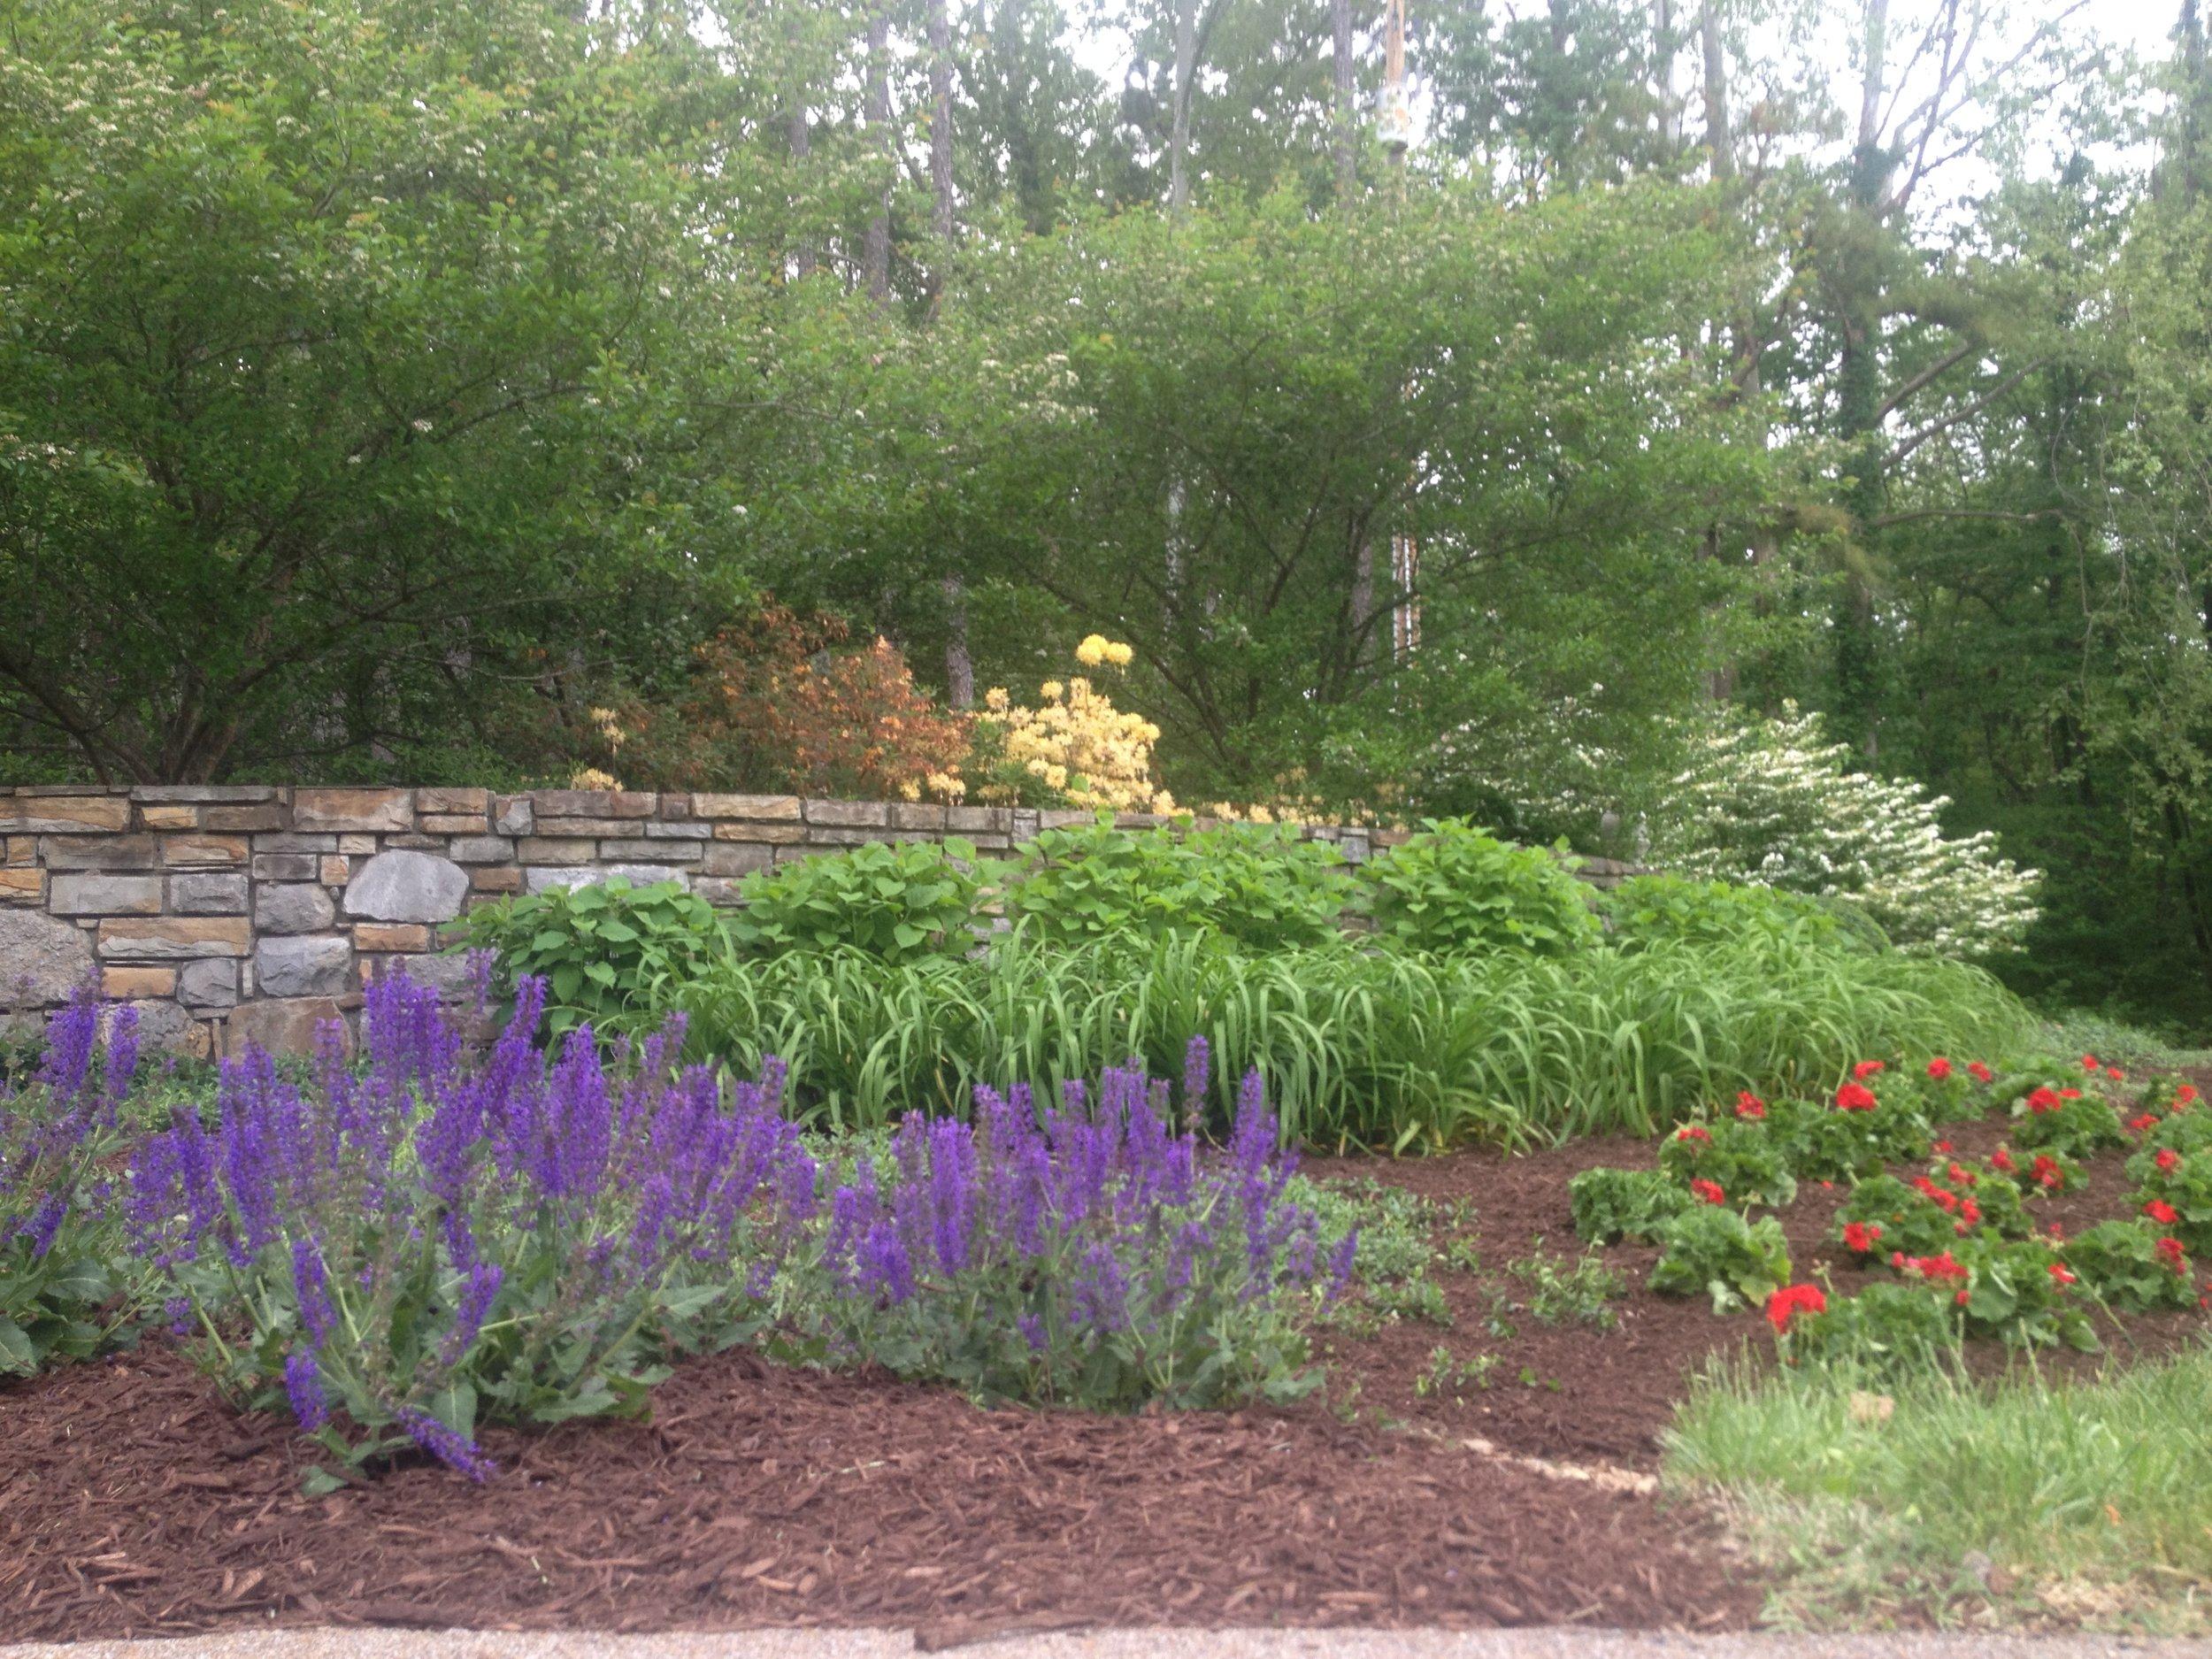 Stillhouse Hollow Annual Plantings 05-08-14.jpg